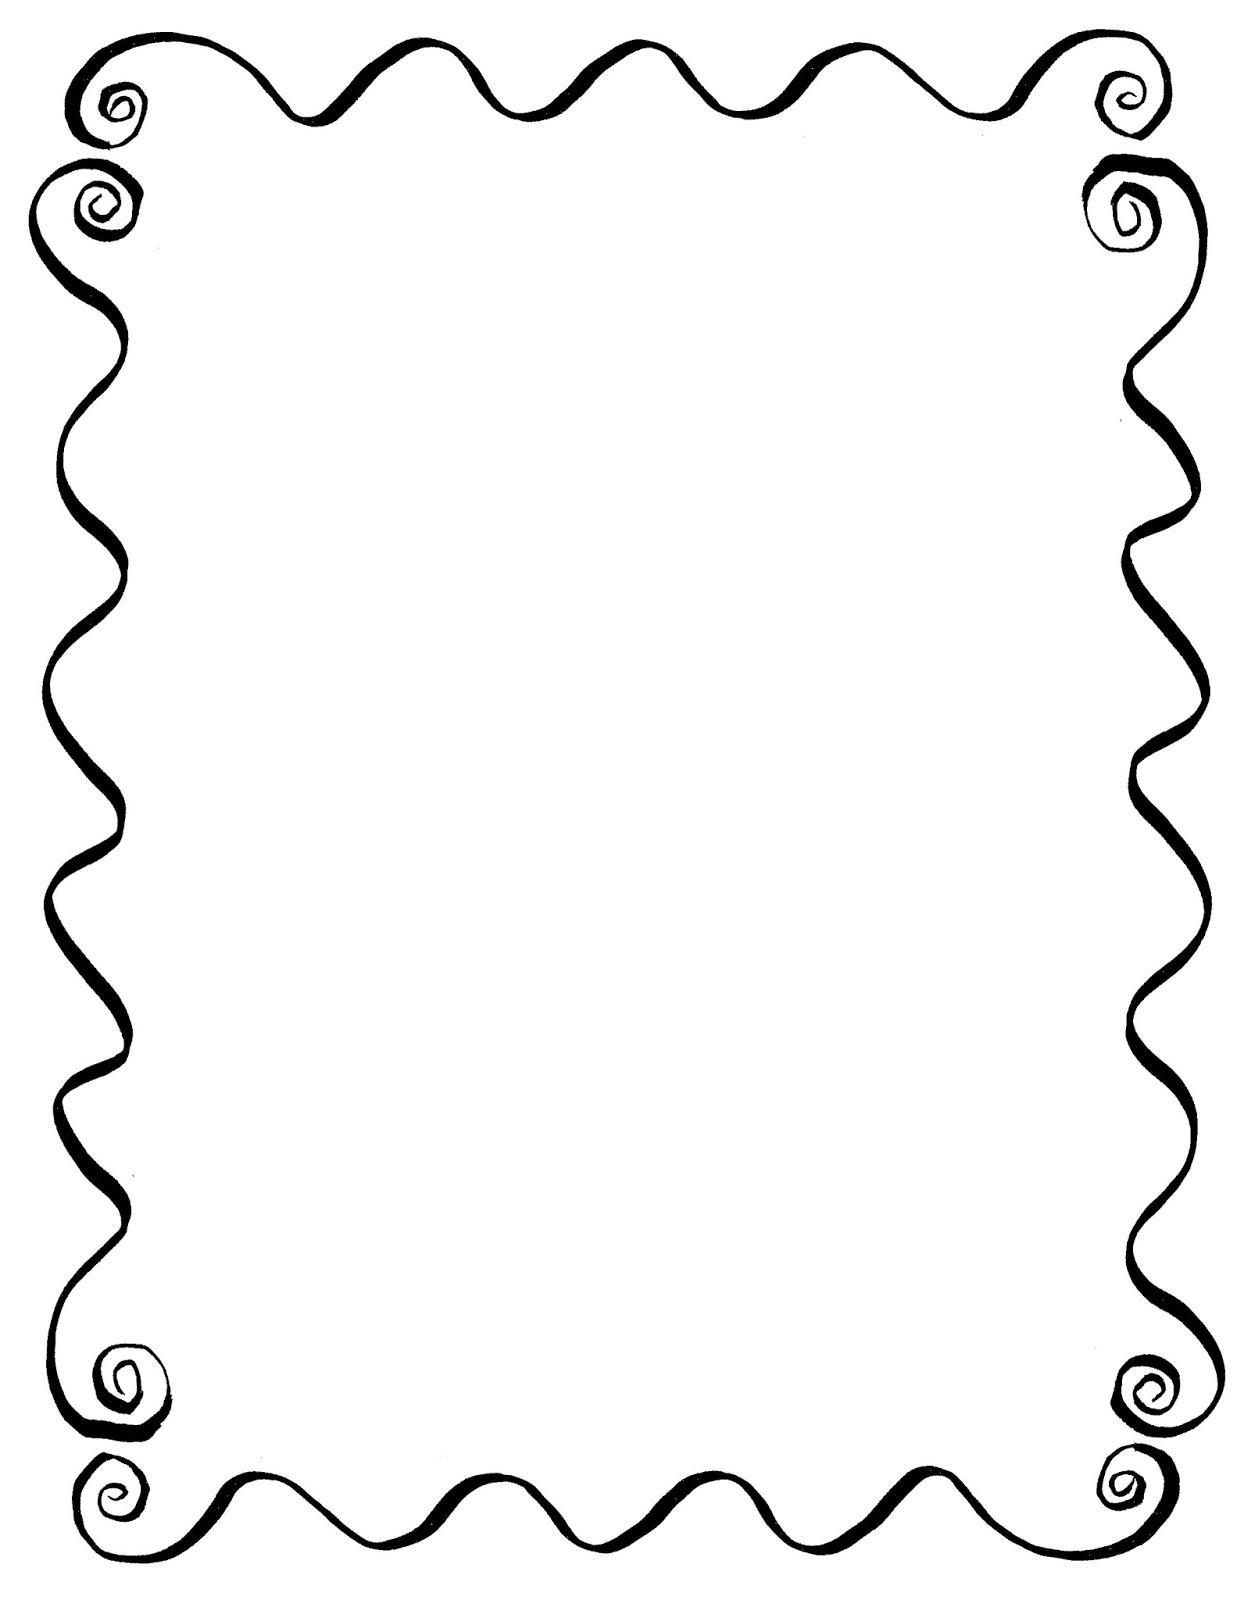 Digital Stamp Design Hand Drawn Decorative Frame Digital